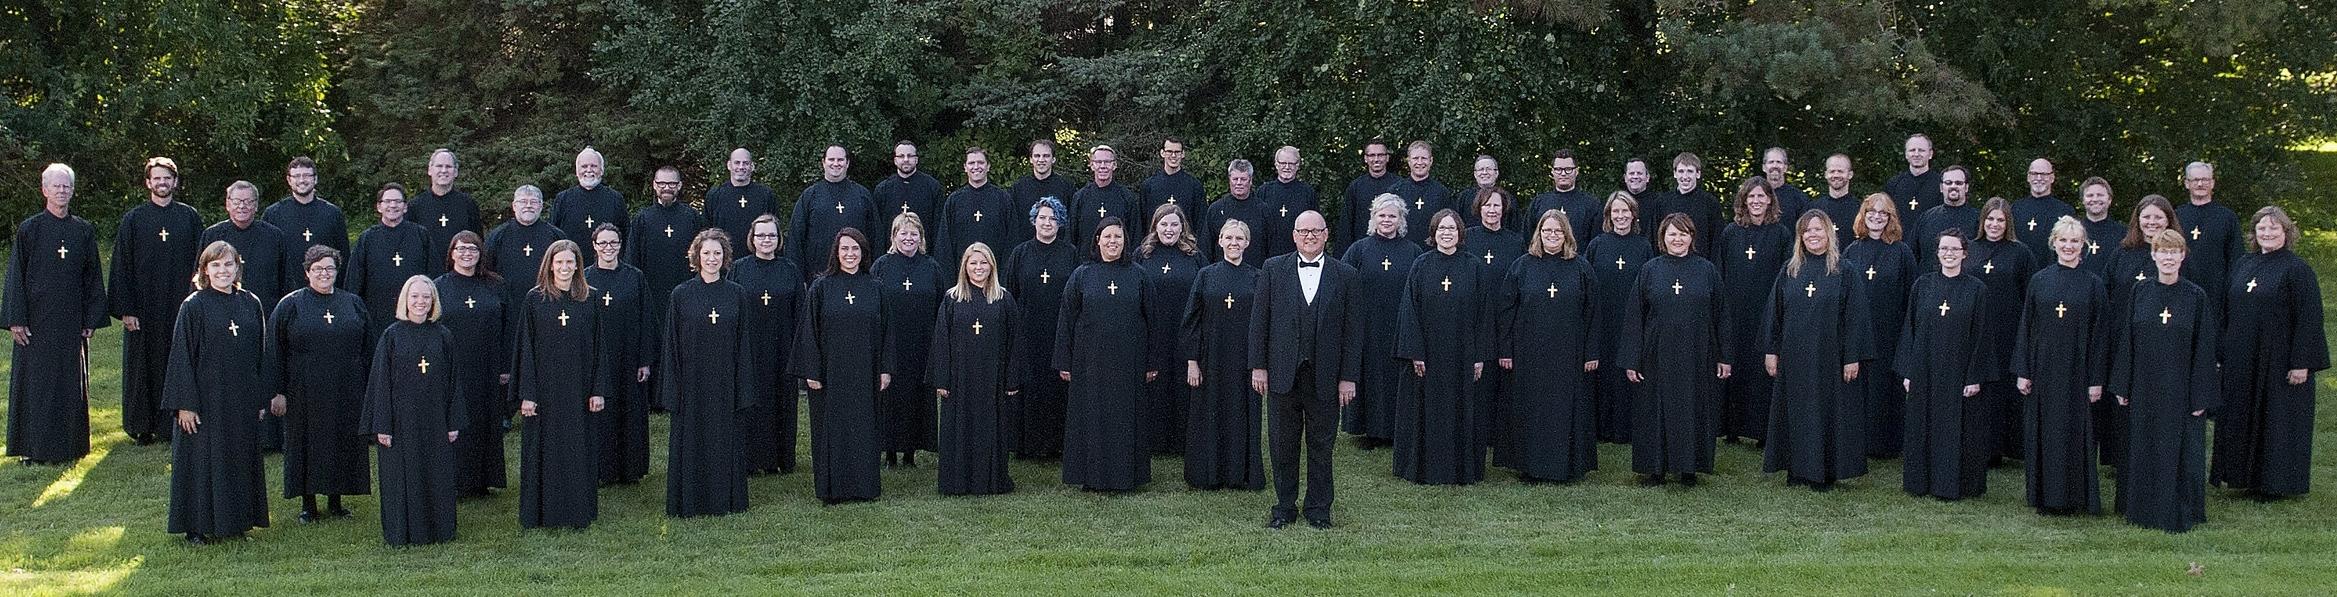 National Lutheran Choir Events